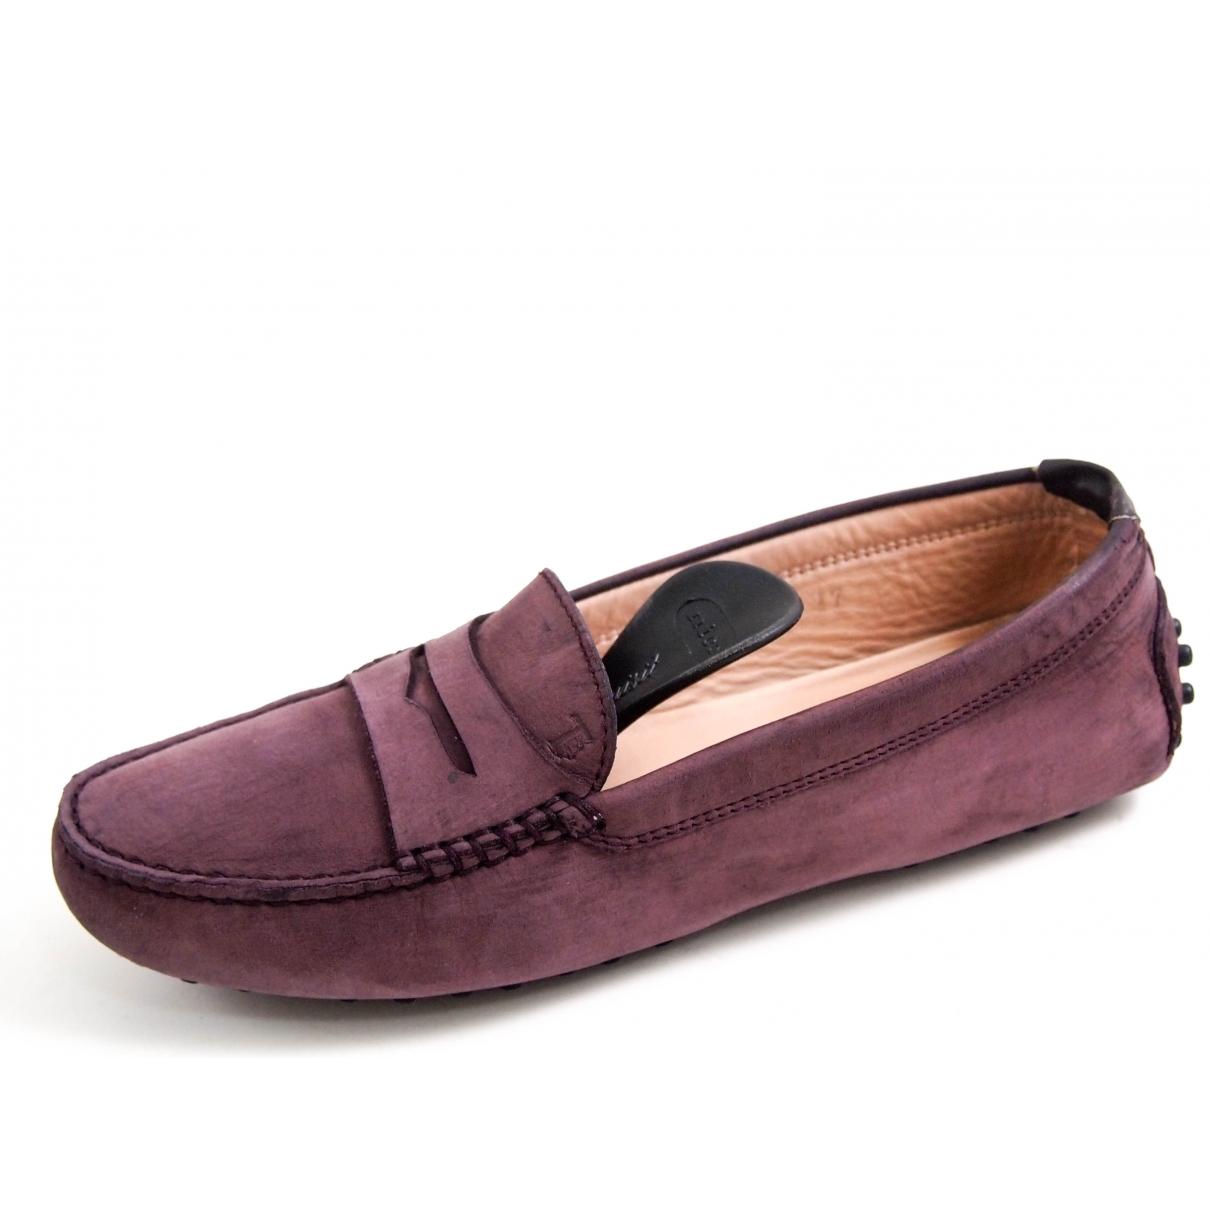 Tod's Gommino Purple Suede Flats for Women 37 EU